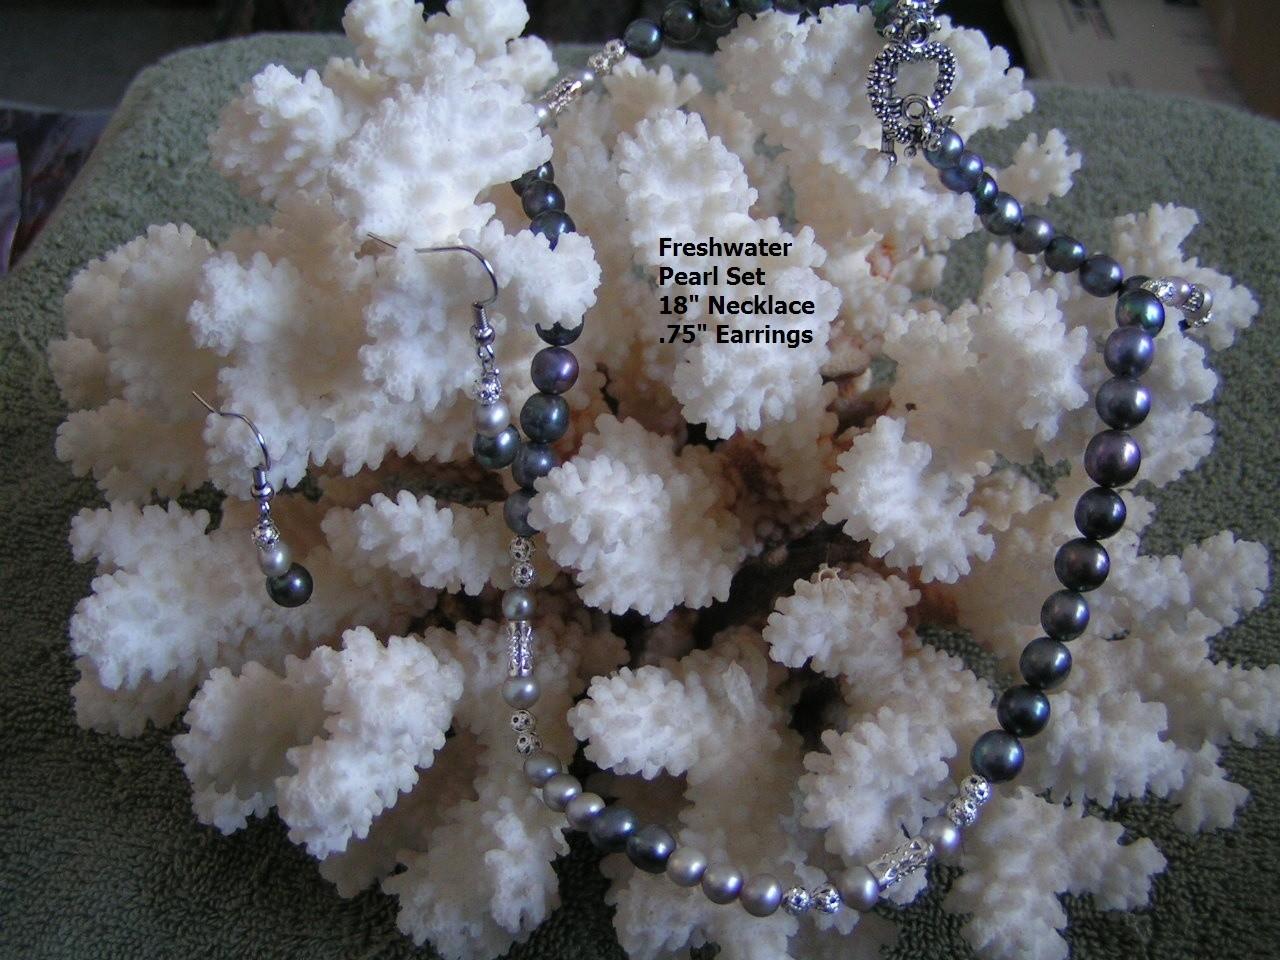 2PC Freshwater Pearl Set Free Shipping